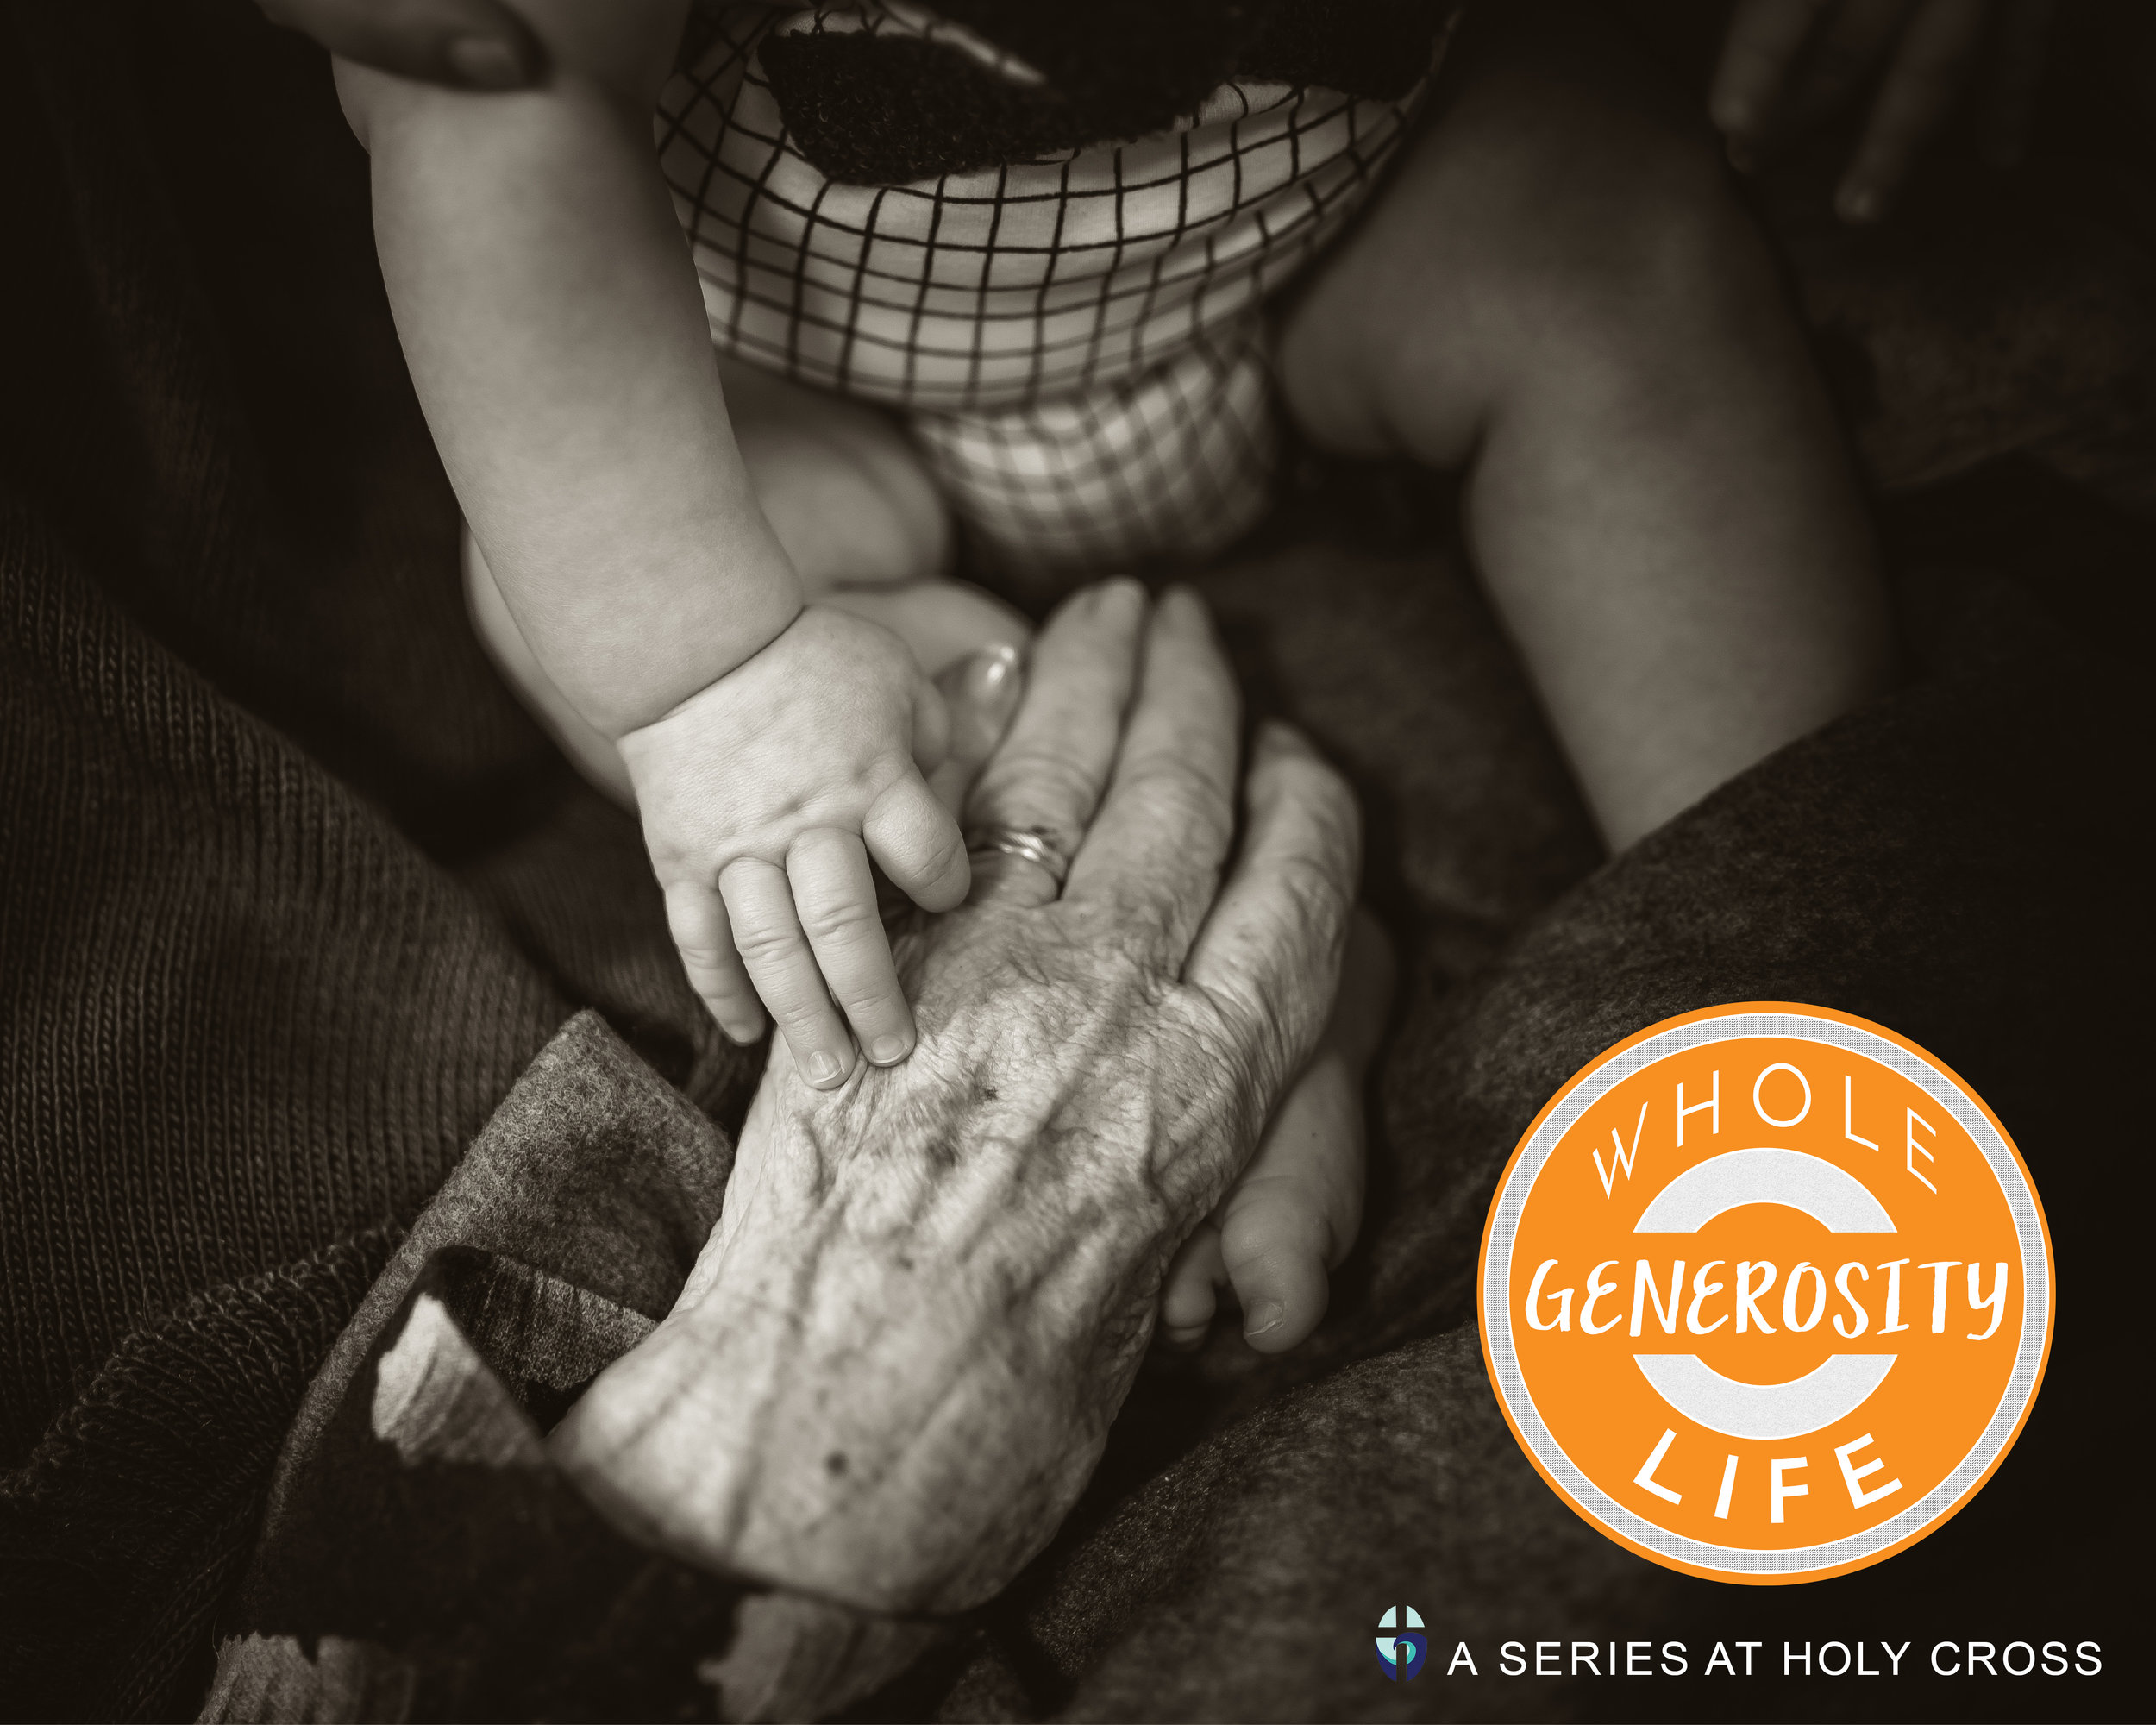 Whole-Generosity-Sermonseries-slide.jpg